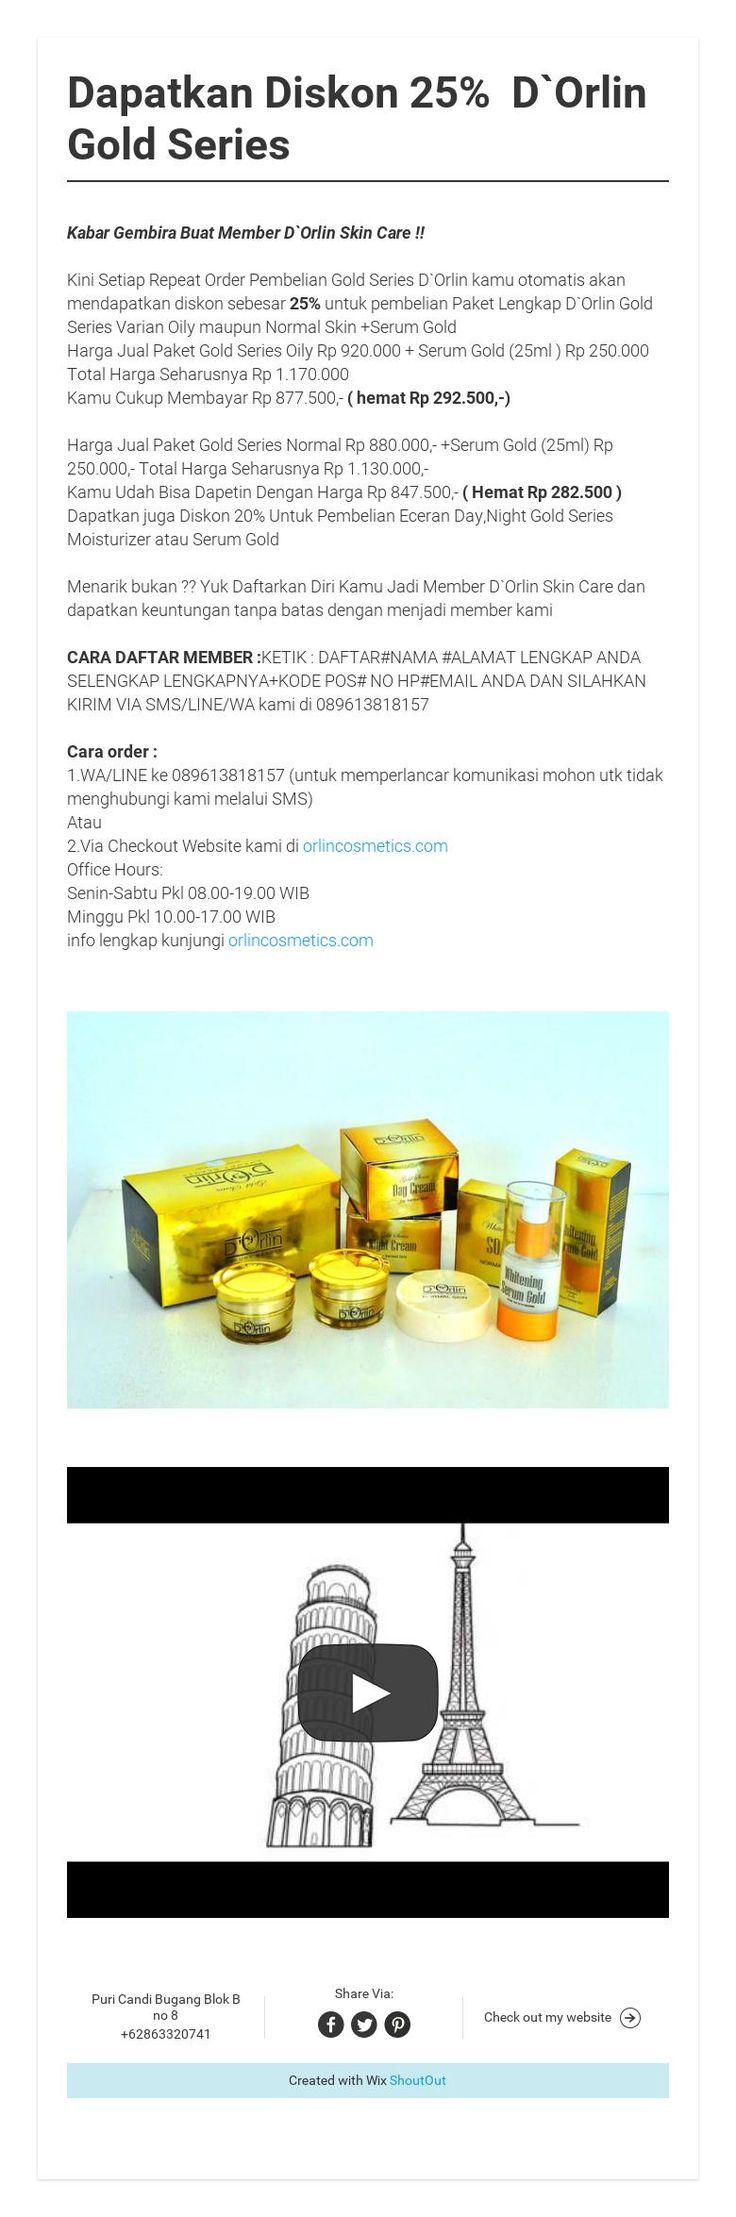 Dapatkan Diskon 25% D`Orlin Gold Series